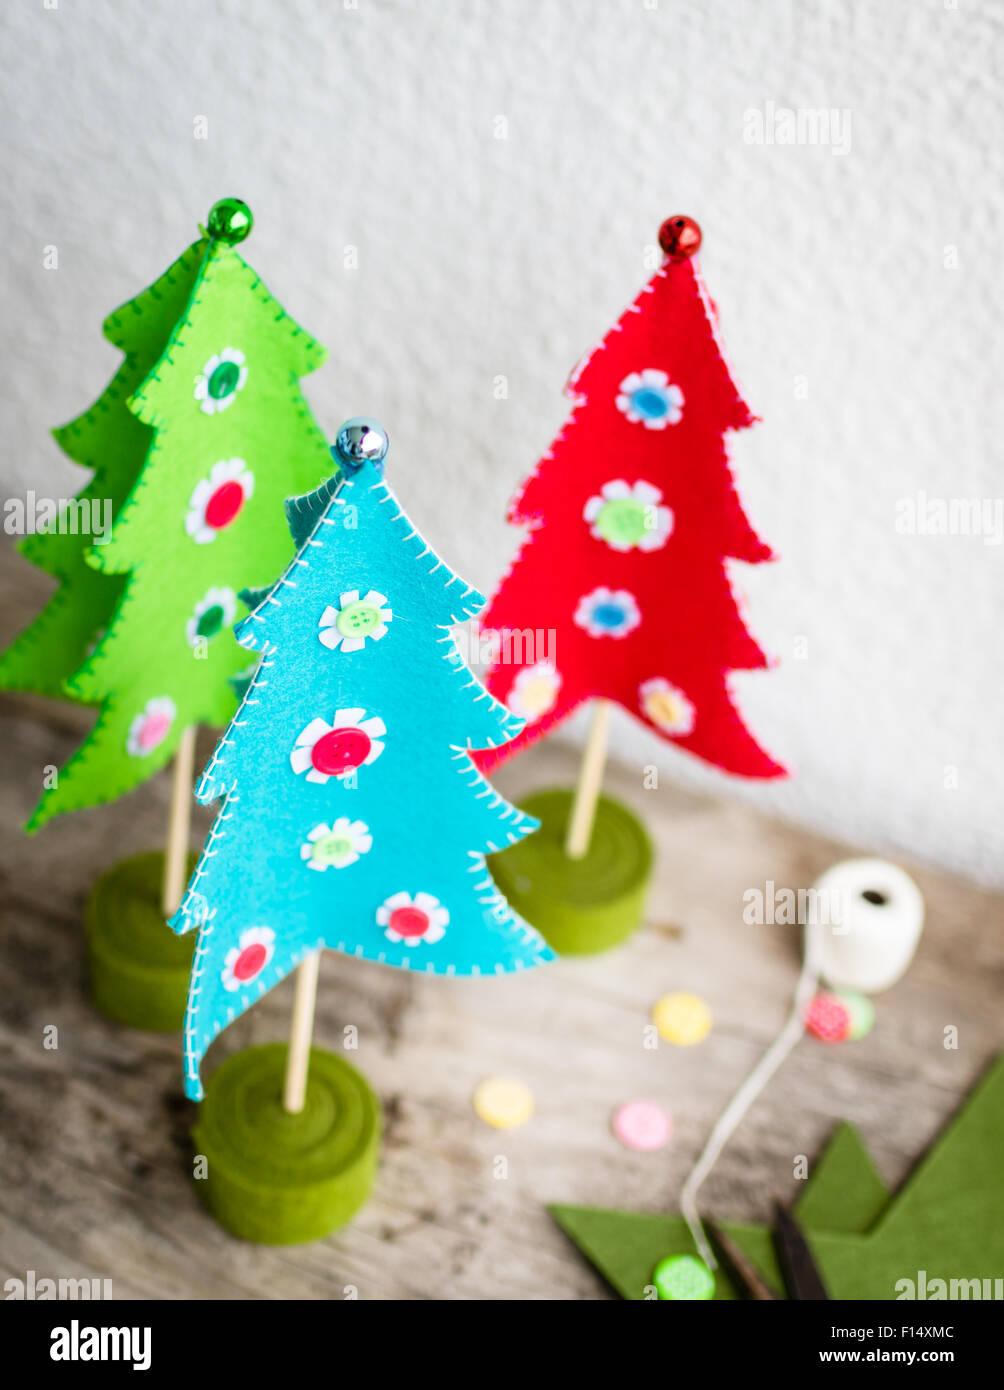 Handmade Colorful Felt Christmas trees, selective focus - Stock Image